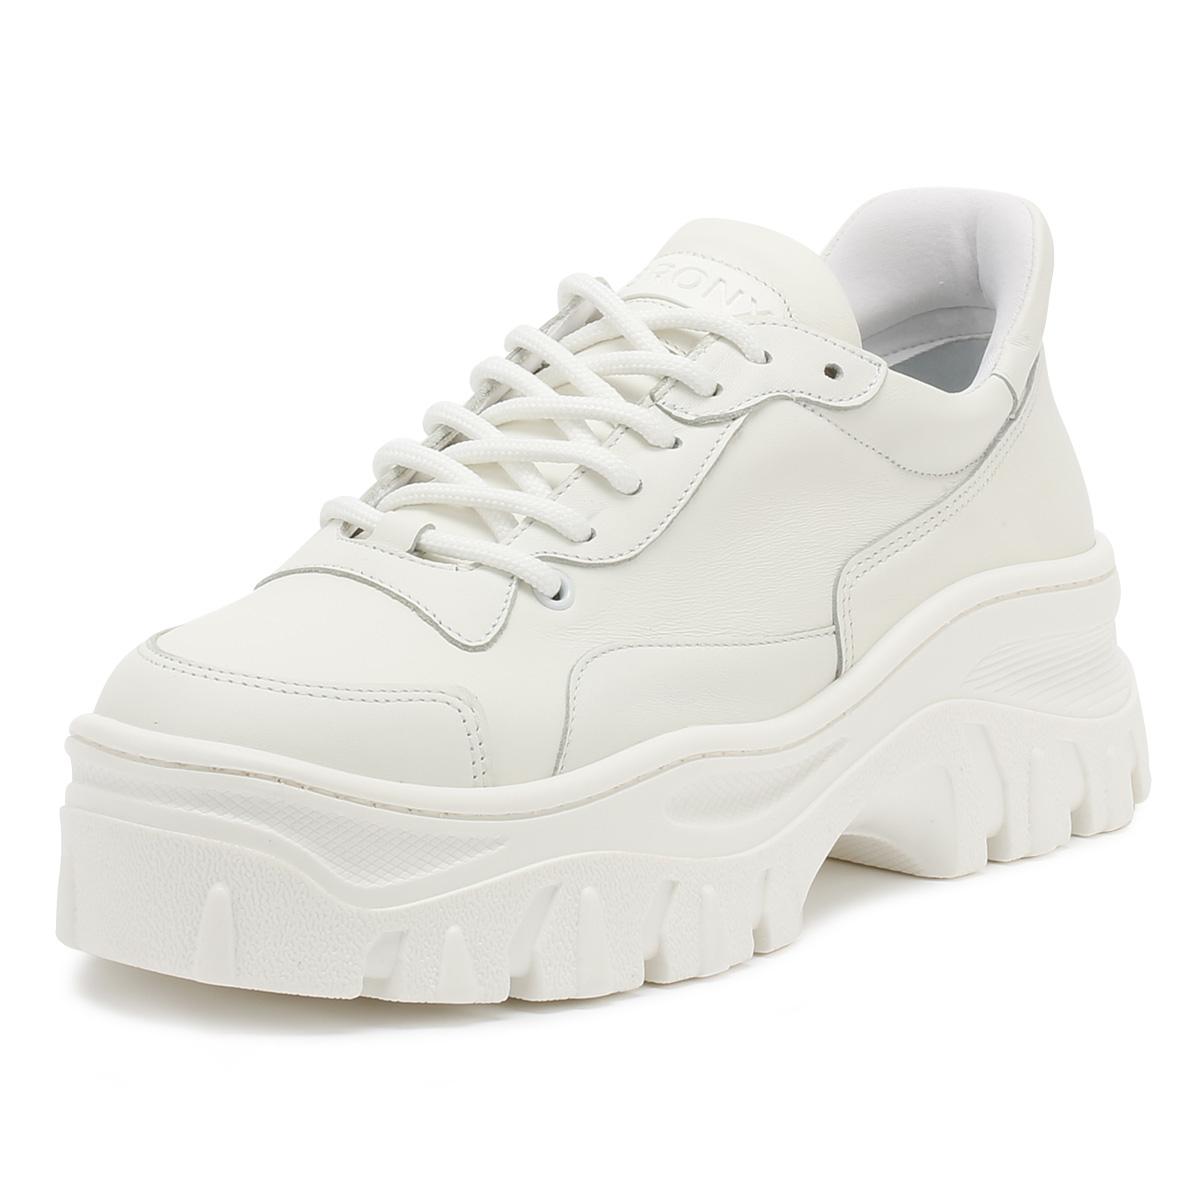 562765d269b Details about Bronx Womens Trainers White Jackson Lace Up Casual Ladies Platform  Shoes